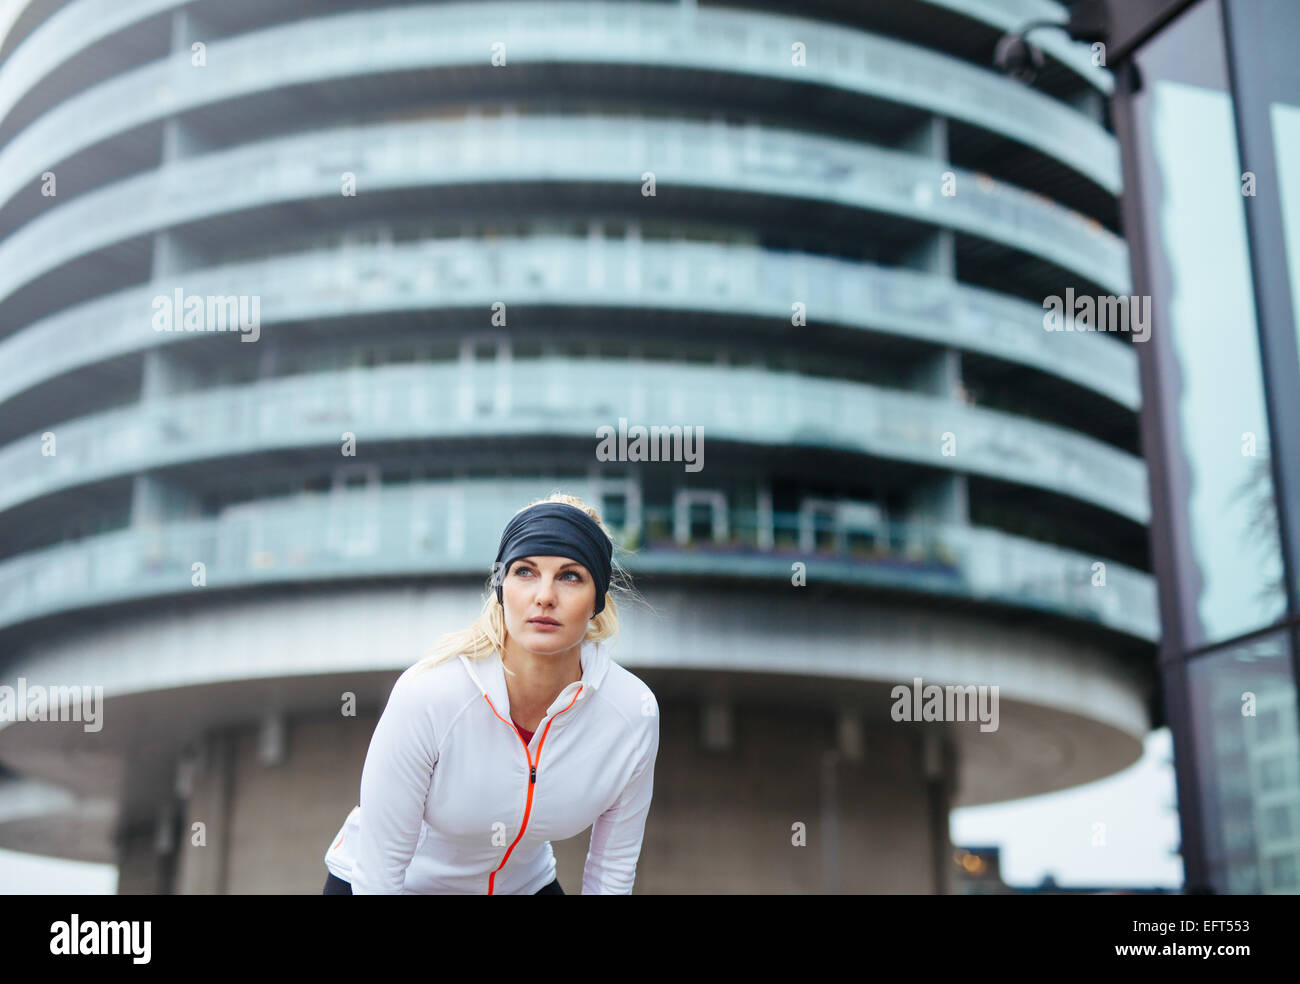 Athlete having a short break from running. Young female exercising on city street. - Stock Image